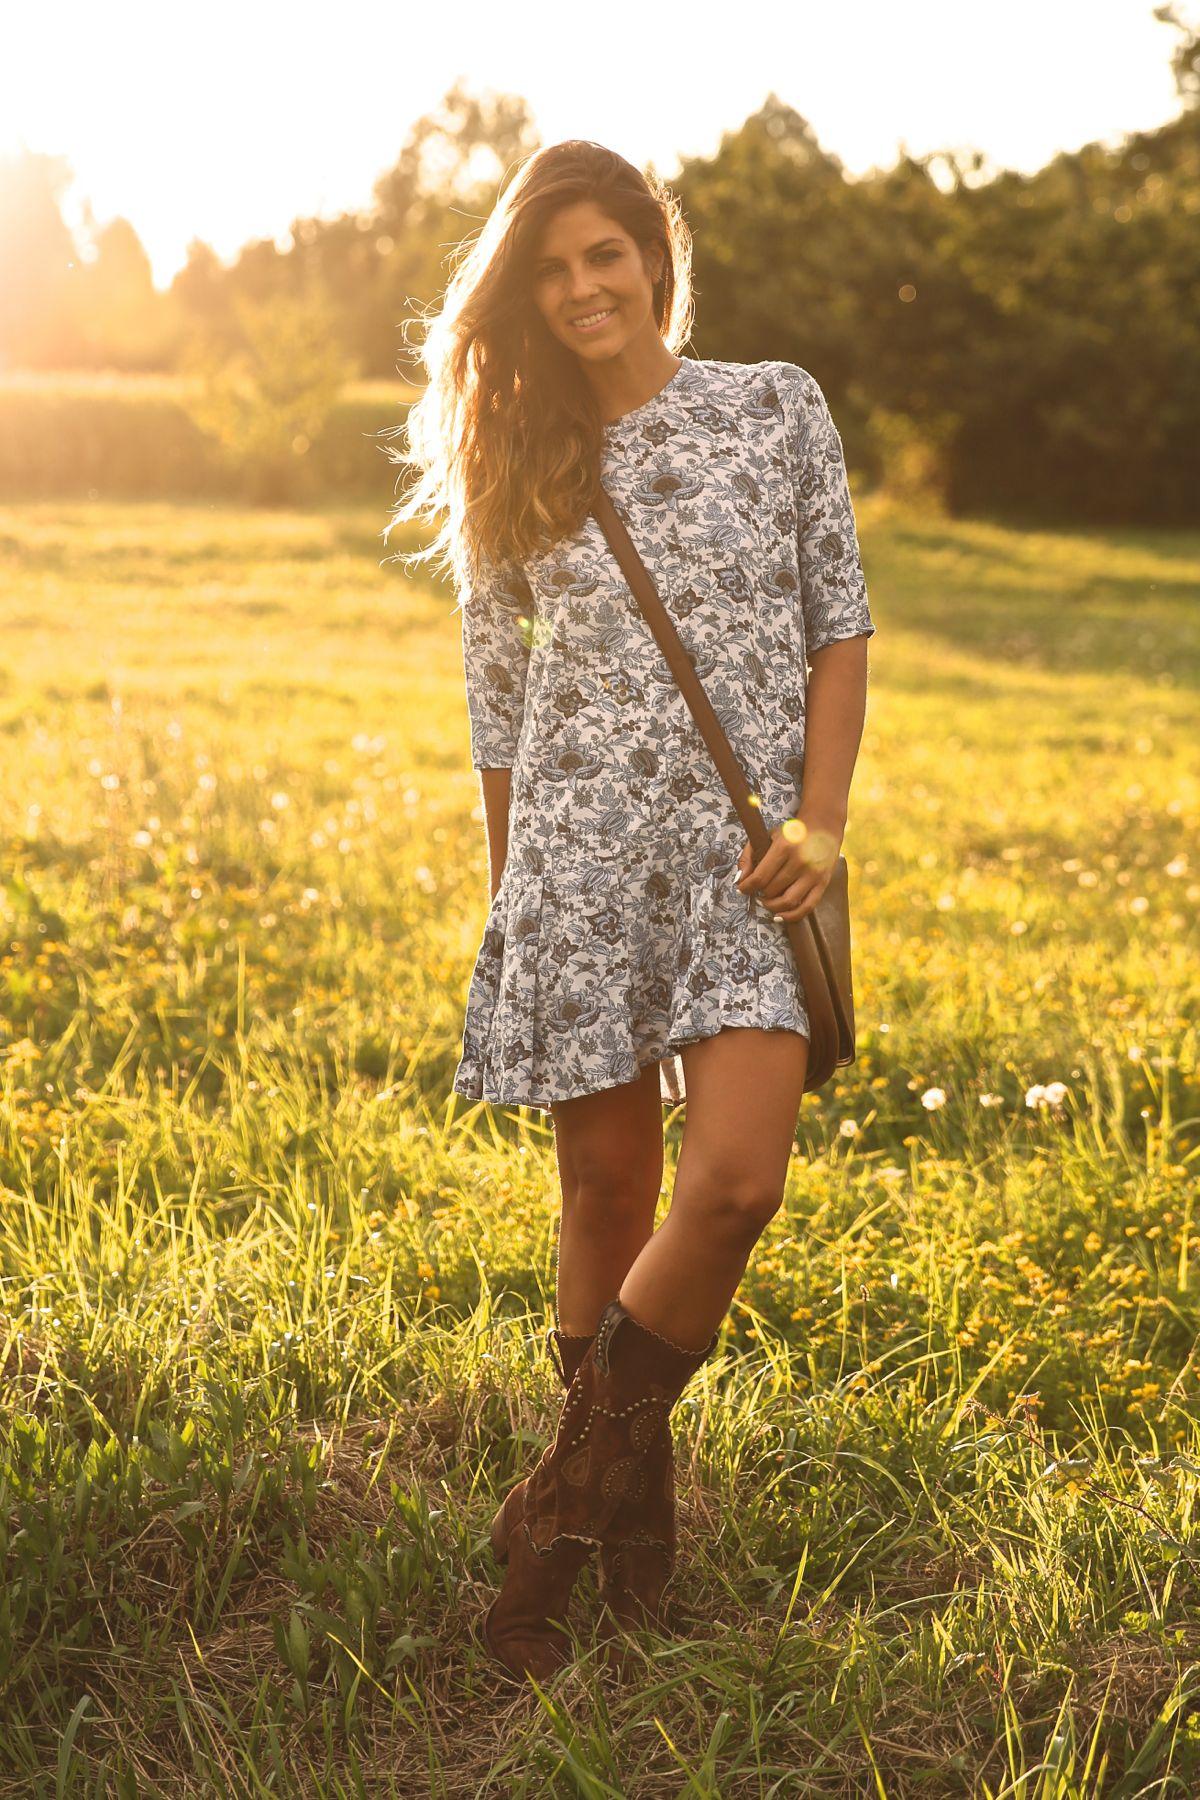 trendy_taste-look-outfit-street_style-ootd-blog-blogger-fashion_spain-moda_españa-cowboy-campero-sendra-cowboy_boots-botas_camperas-loewe-bag-bolso-vestido_flores-flower_print-dress-7